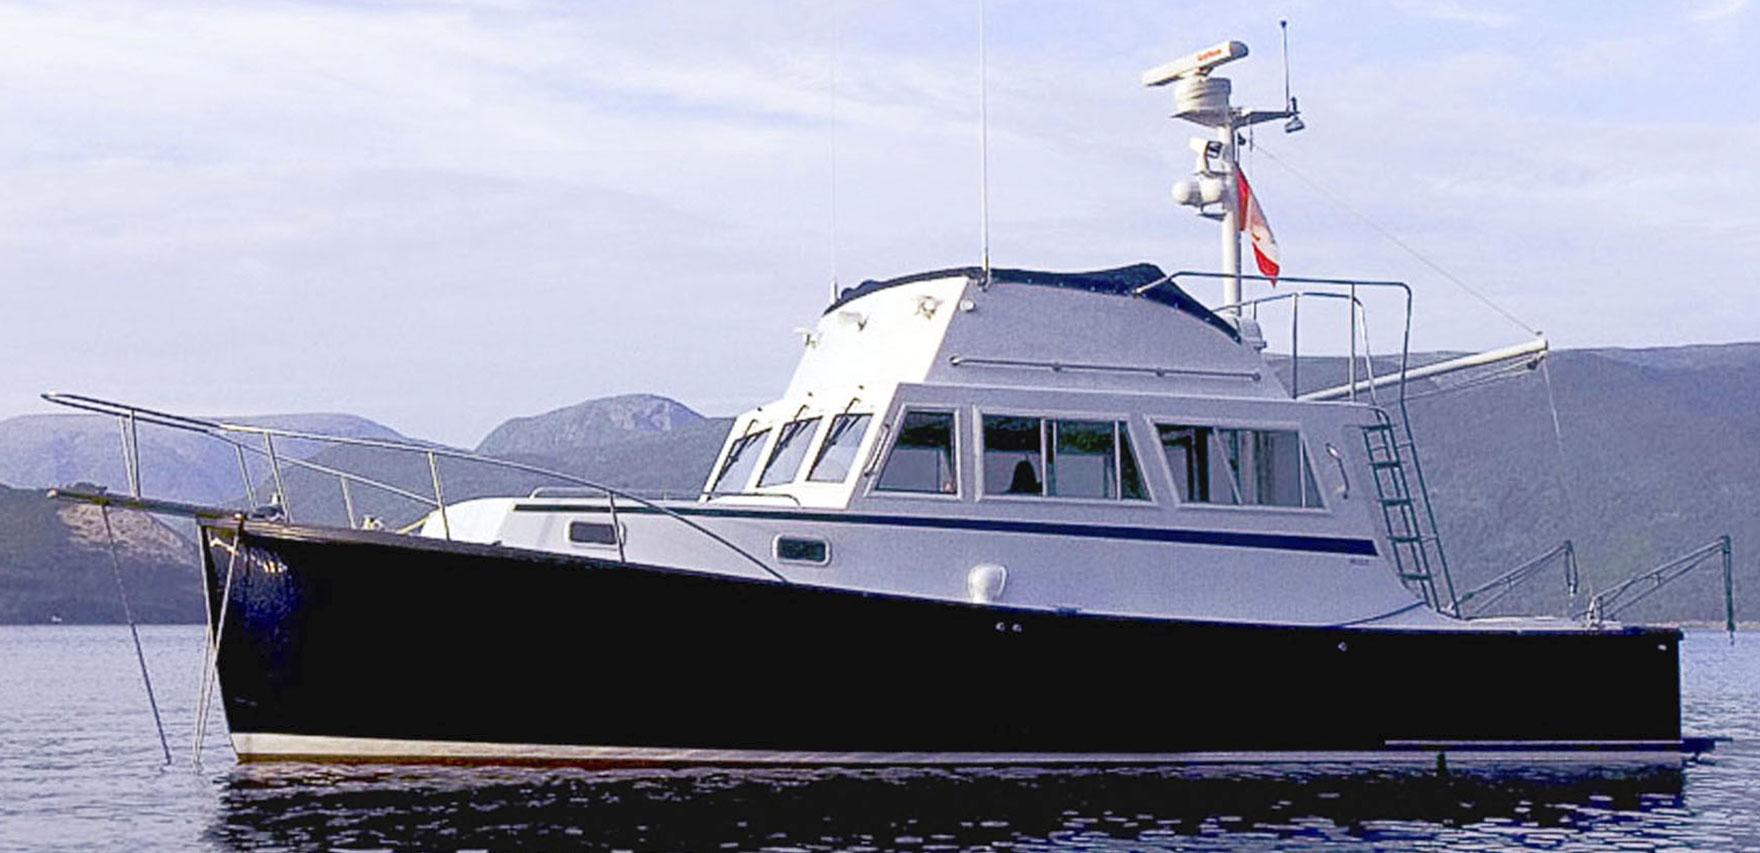 Ellis Boat For Sale: Ellis 32 Flybridge Cruiser